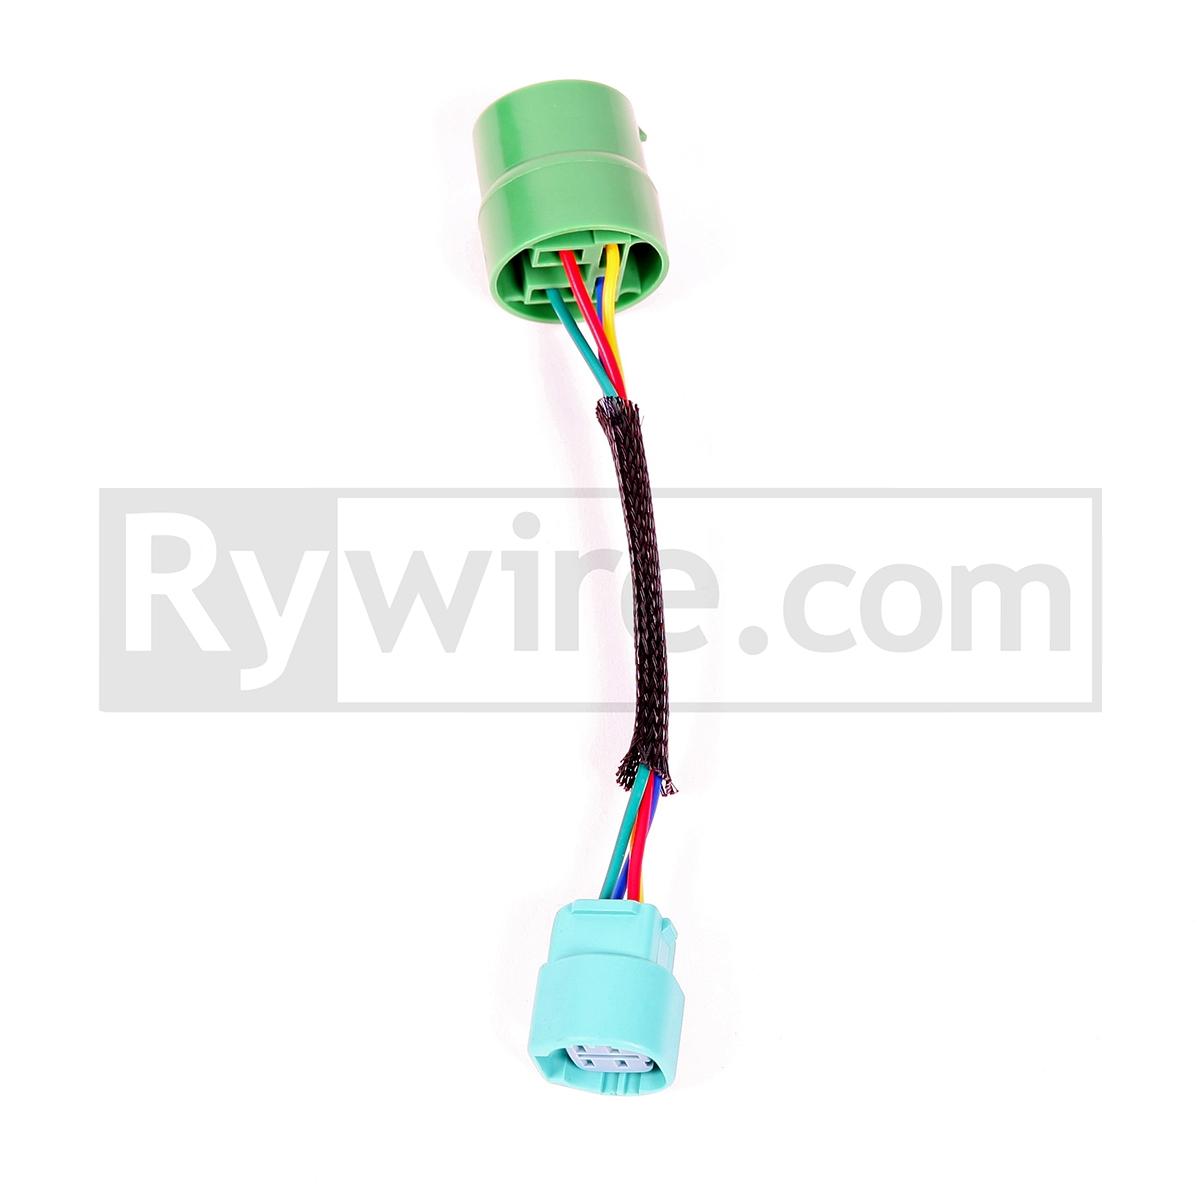 obd2 to obd1 wiring diagram xd 8796  obd2 to obd1 distributor wiring diagram on obd location  obd2 to obd1 distributor wiring diagram